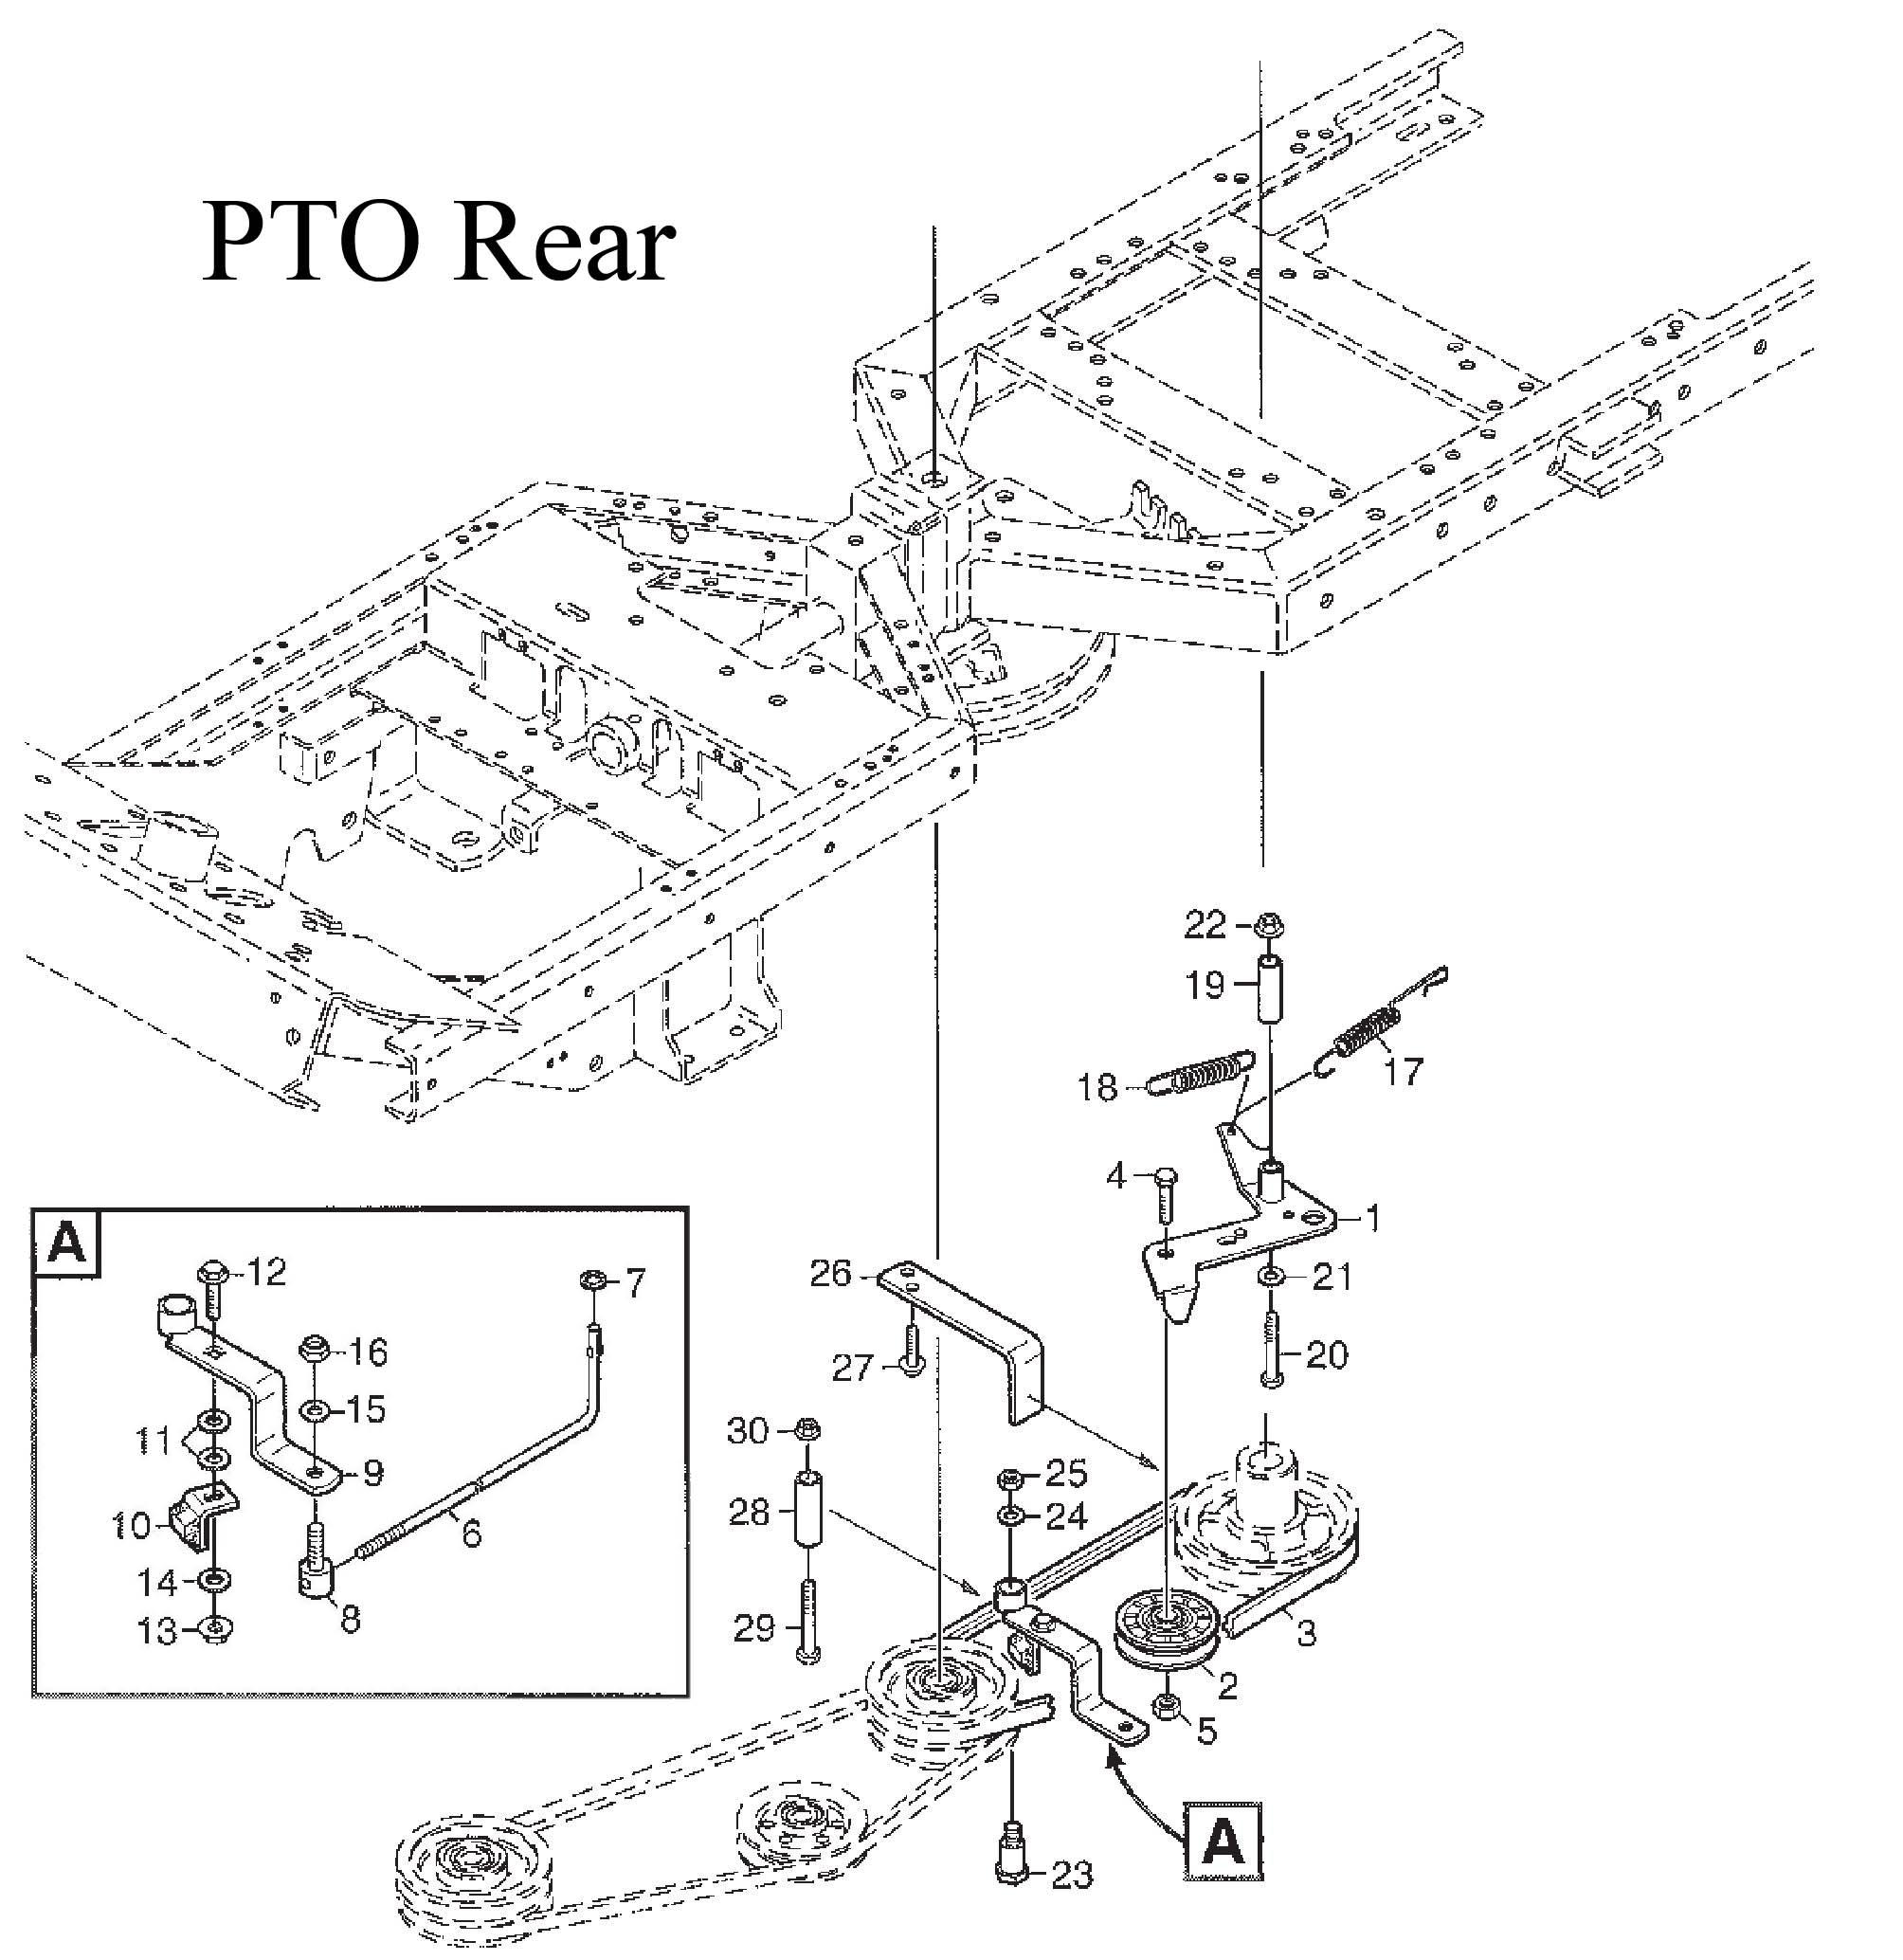 Woods Mower Parts Diagrams Woods Mower 1250 Manual